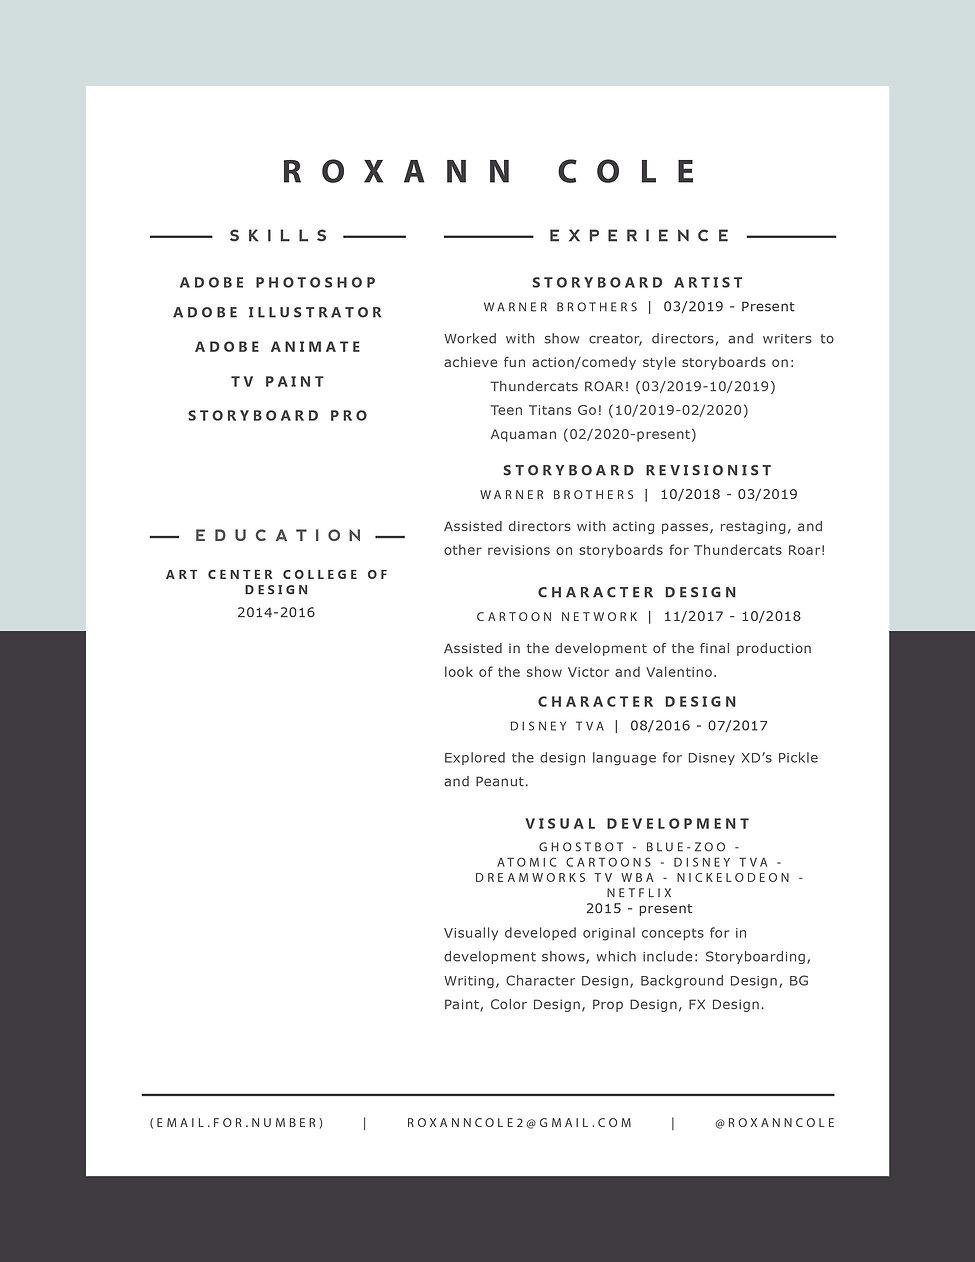 Resume ROXANN COLE 2020.jpg